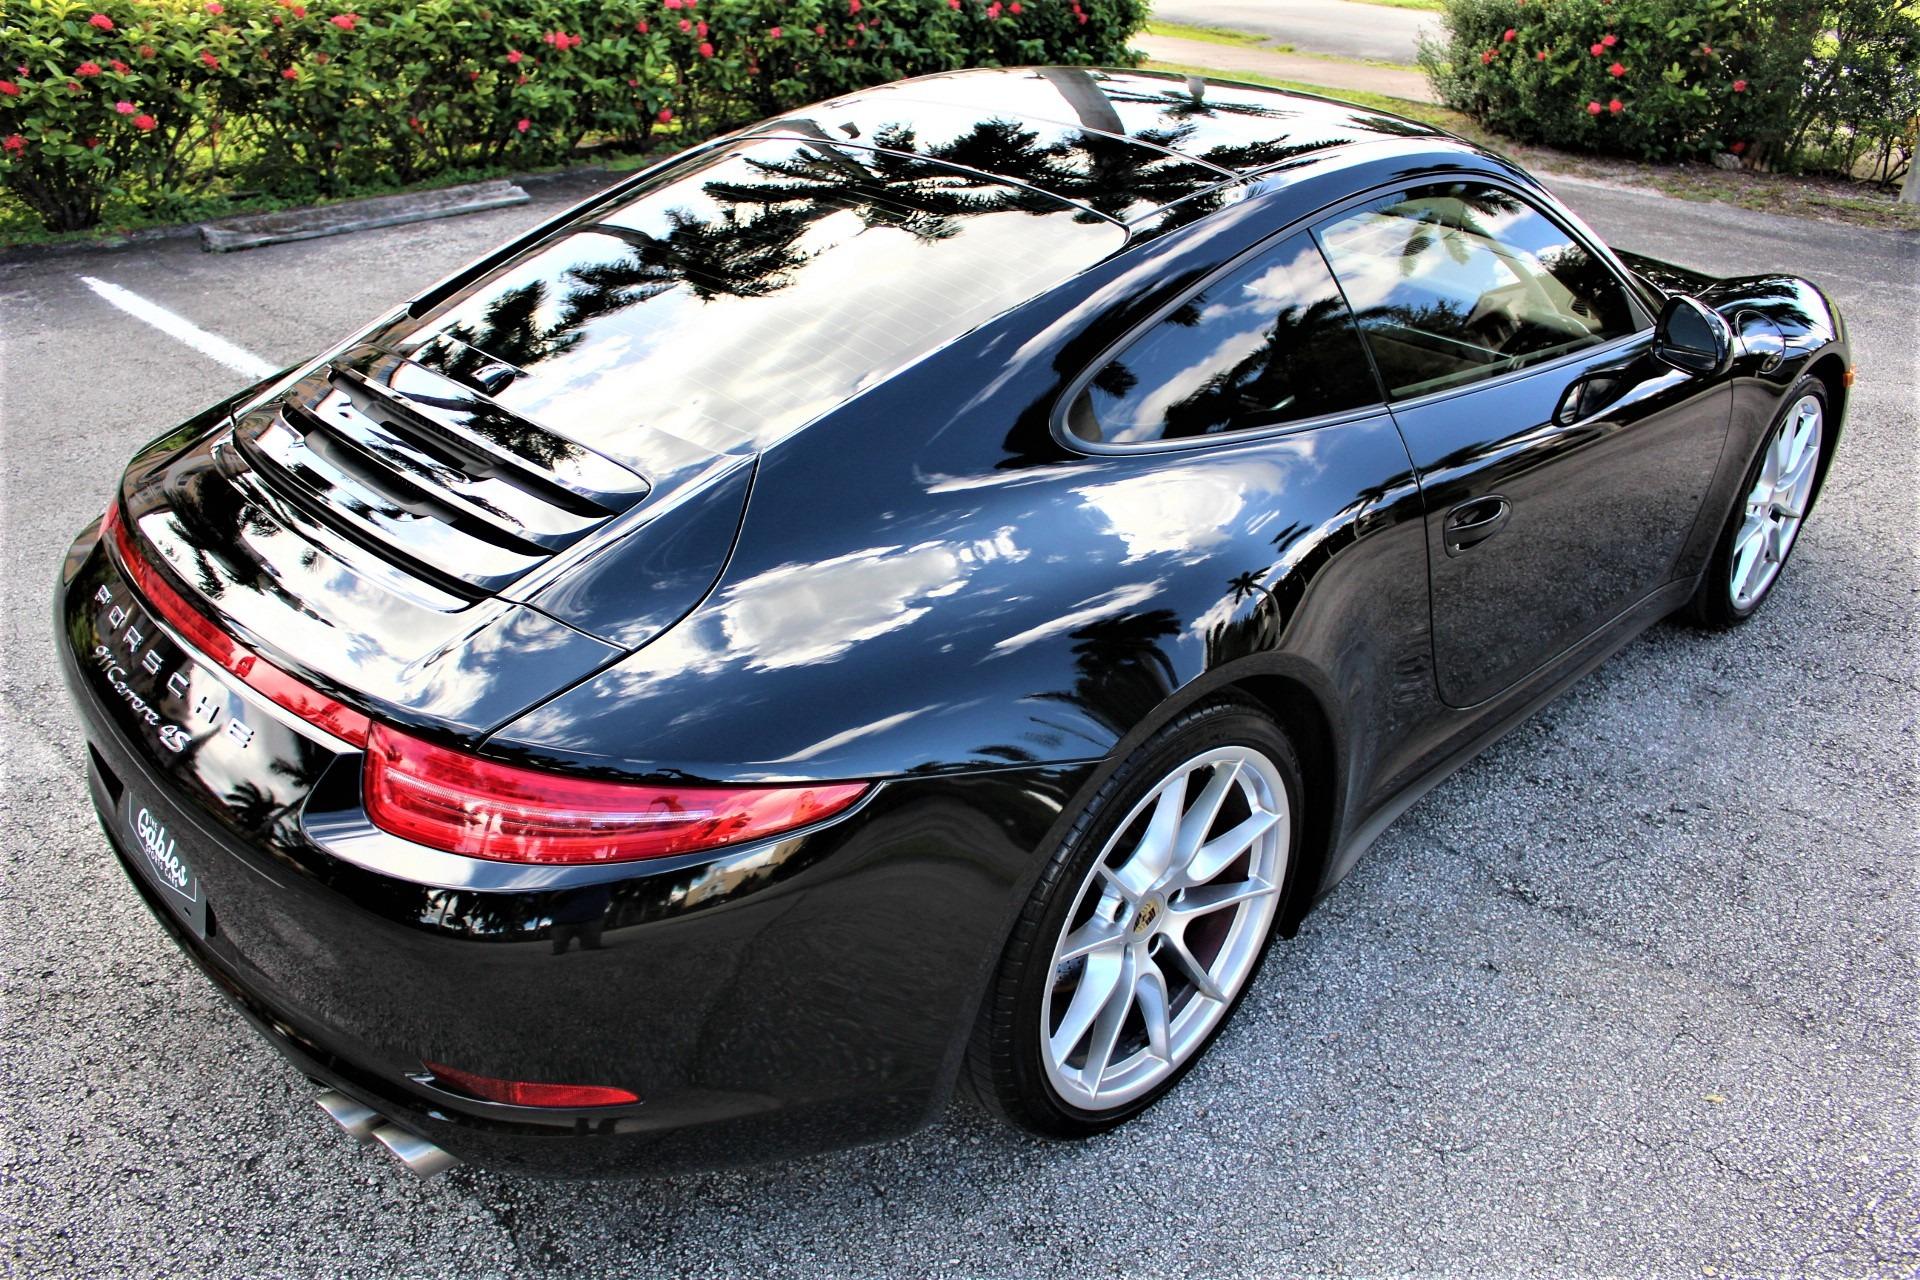 Used 2013 Porsche 911 Carrera 4S for sale $69,850 at The Gables Sports Cars in Miami FL 33146 2